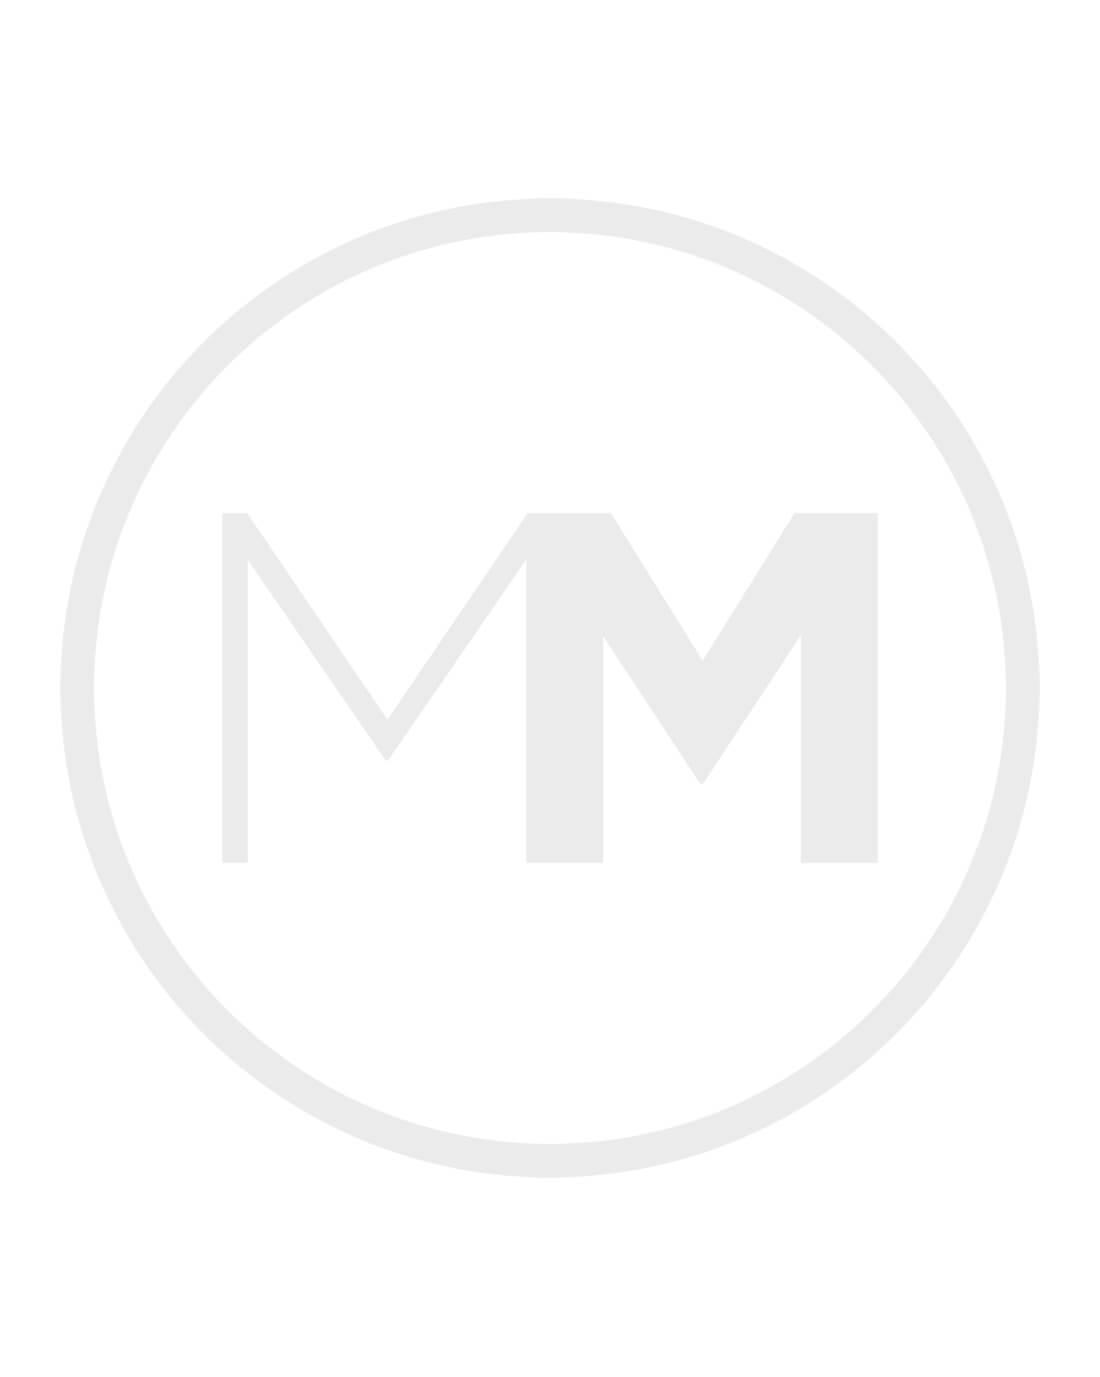 Expresso Milan Pullover grijs